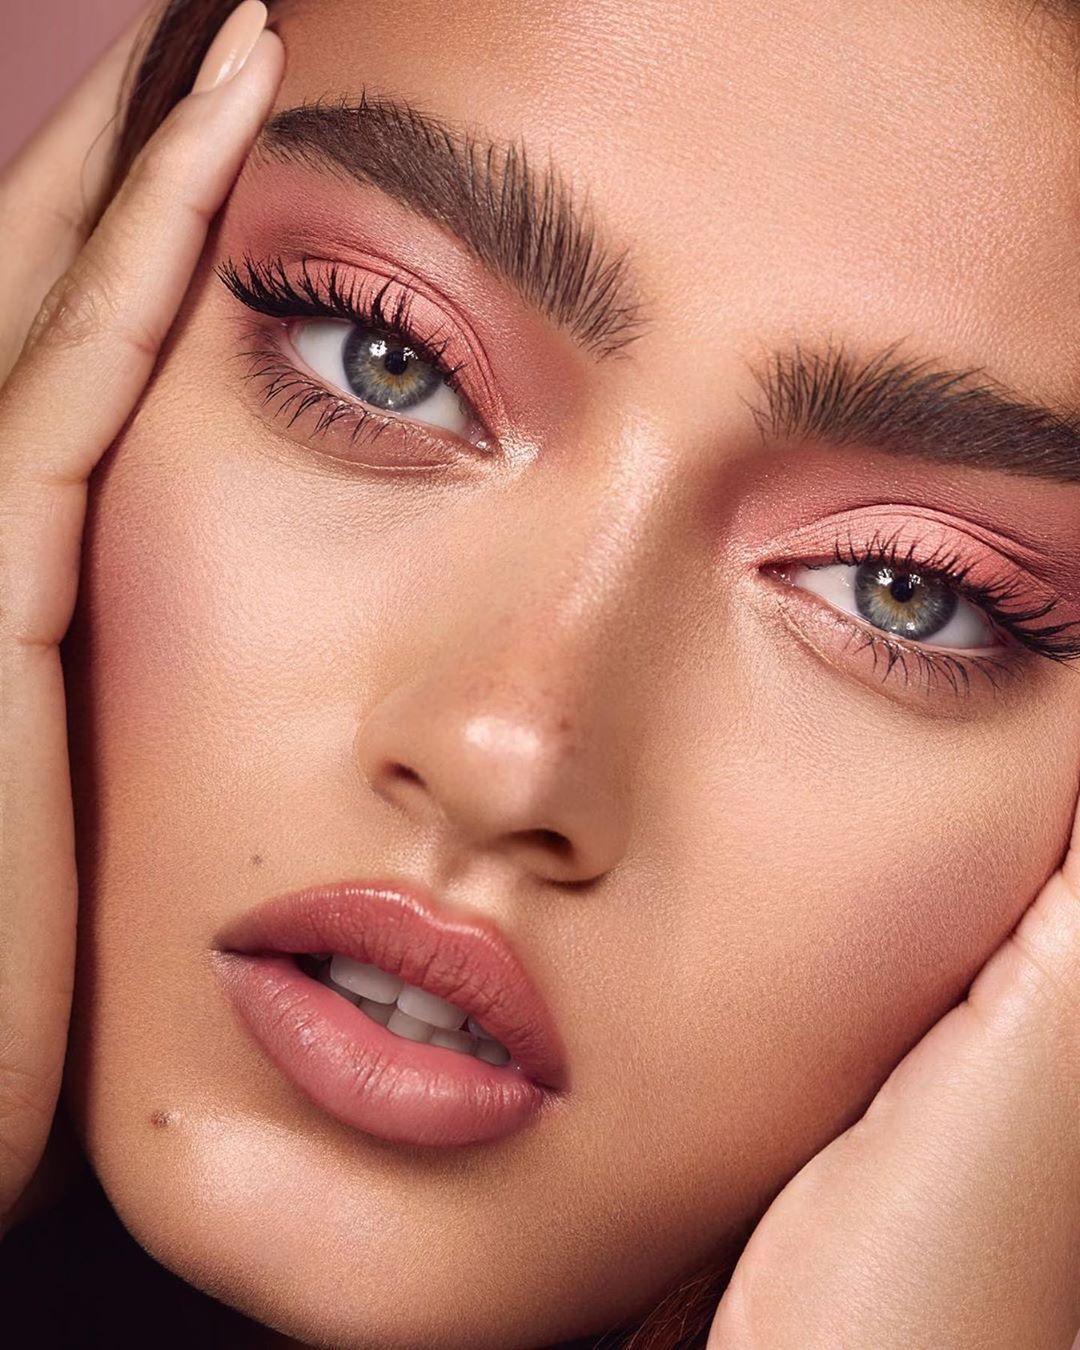 Glamazon Kuwait On Instagram Makeup By Mar Castelli Model Belexib Photography Inesgarciabaltar Retou In 2020 Monochromatic Makeup Editorial Makeup Skin Makeup